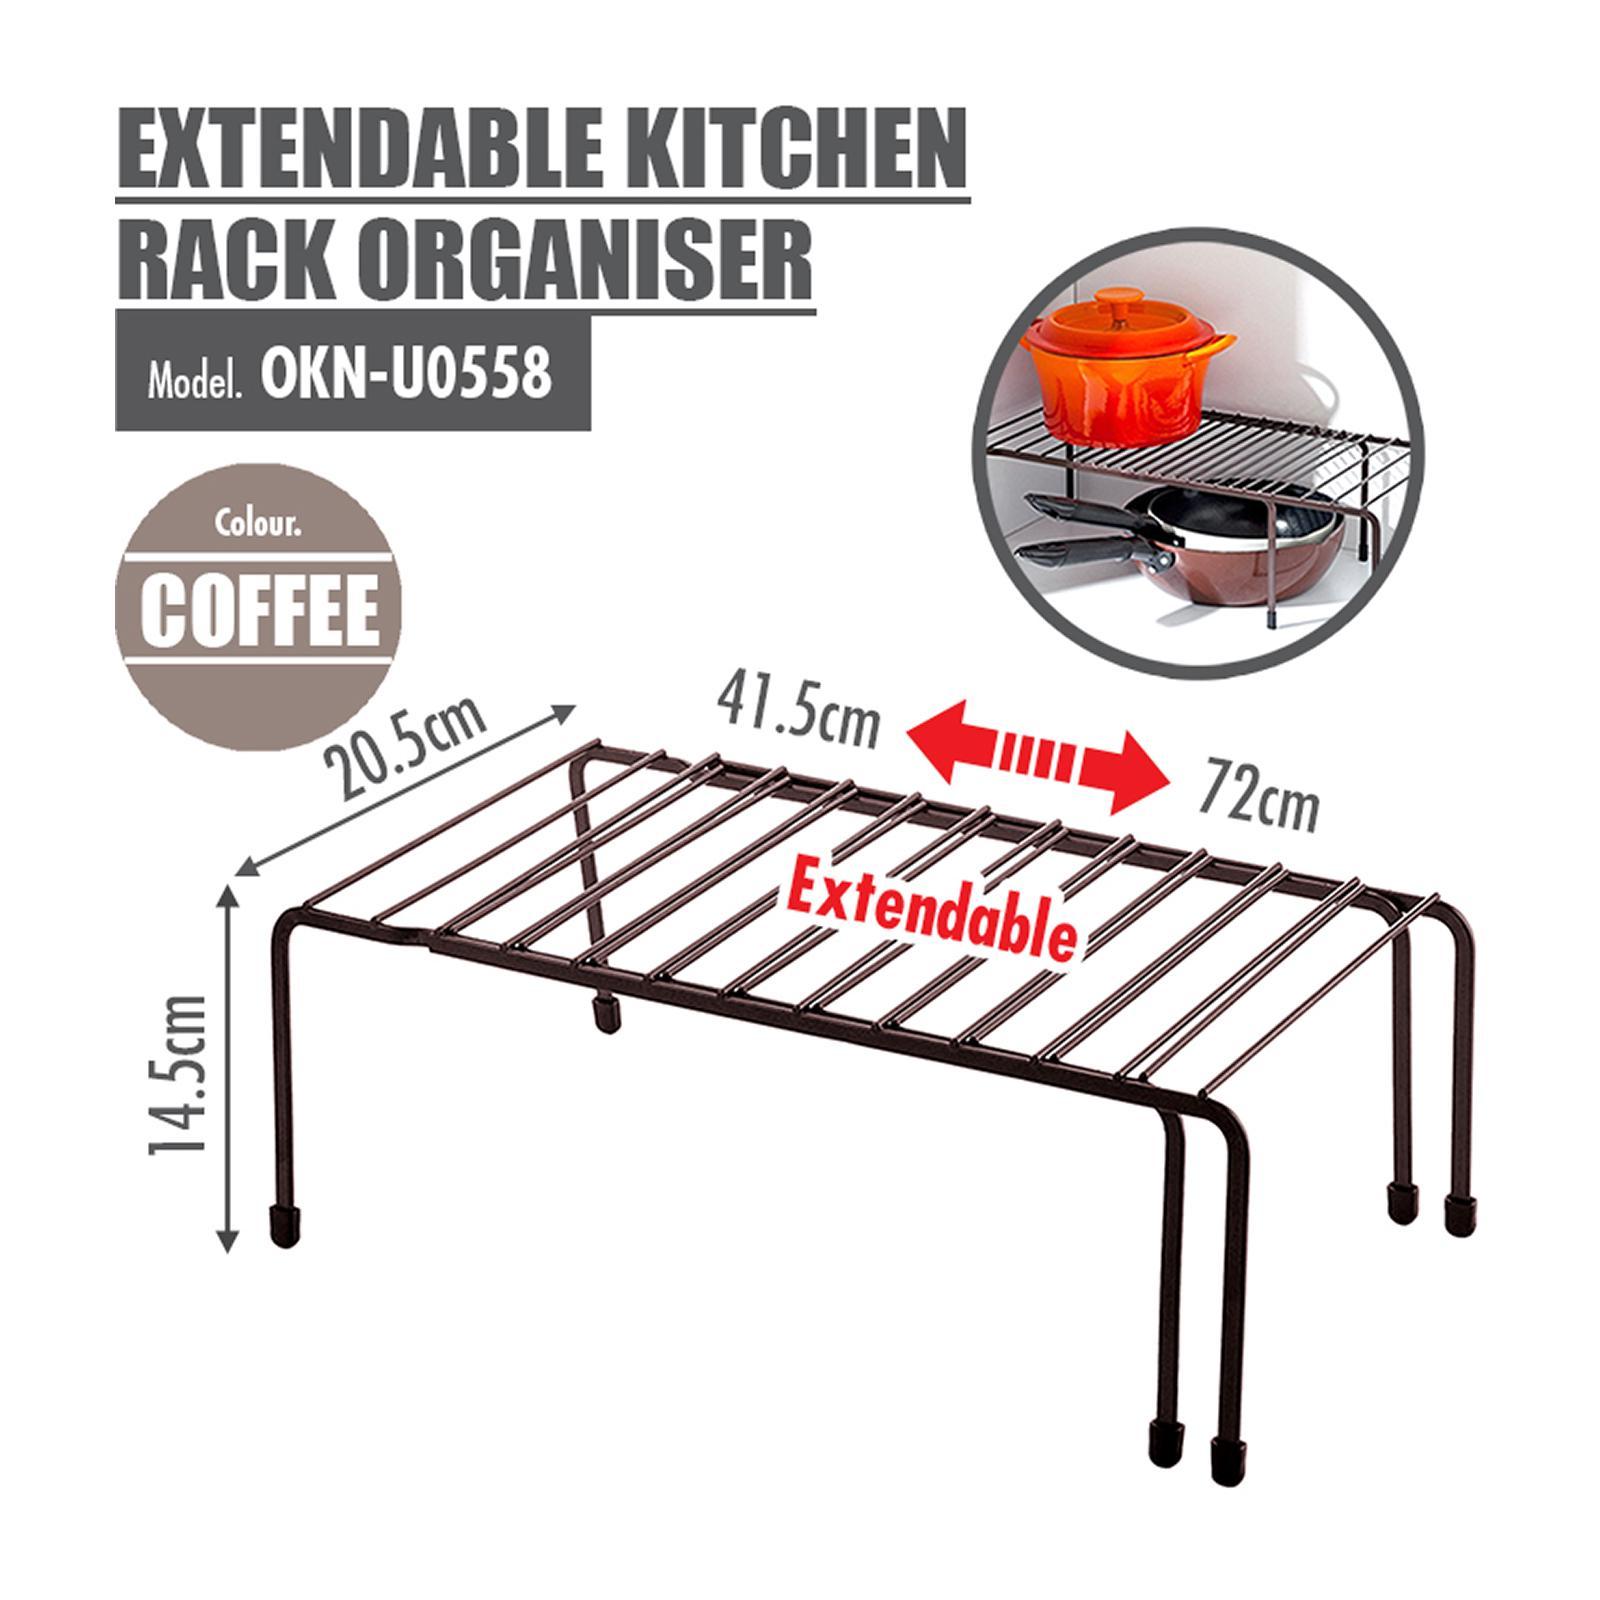 HOUZE Extendable Kitchen Rack Organiser (Black)